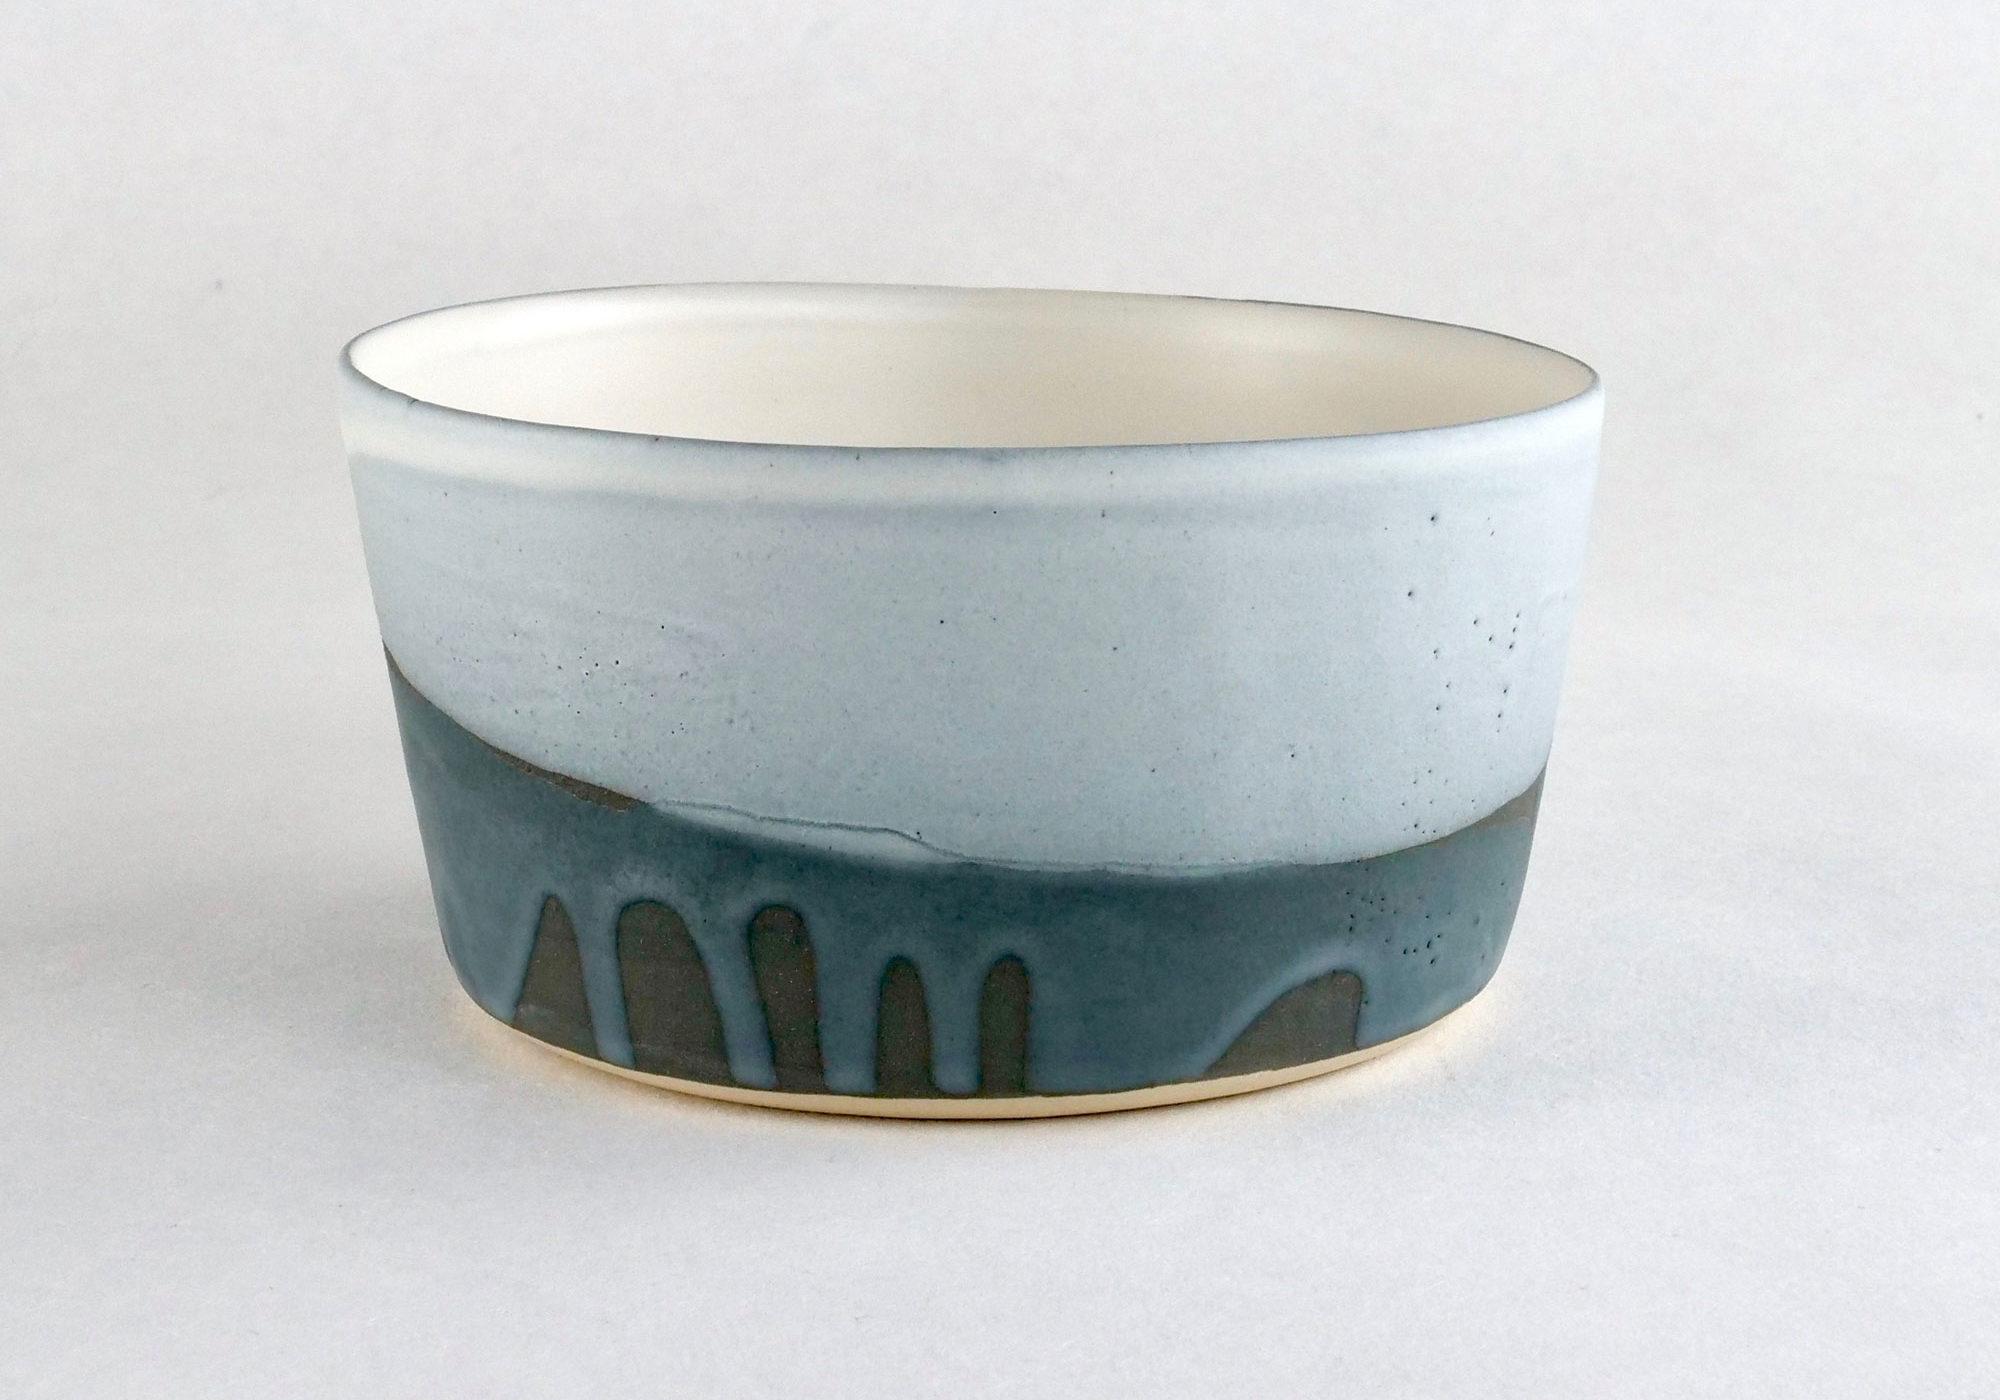 01-bol-aline-lafollie-ceramique-poterie